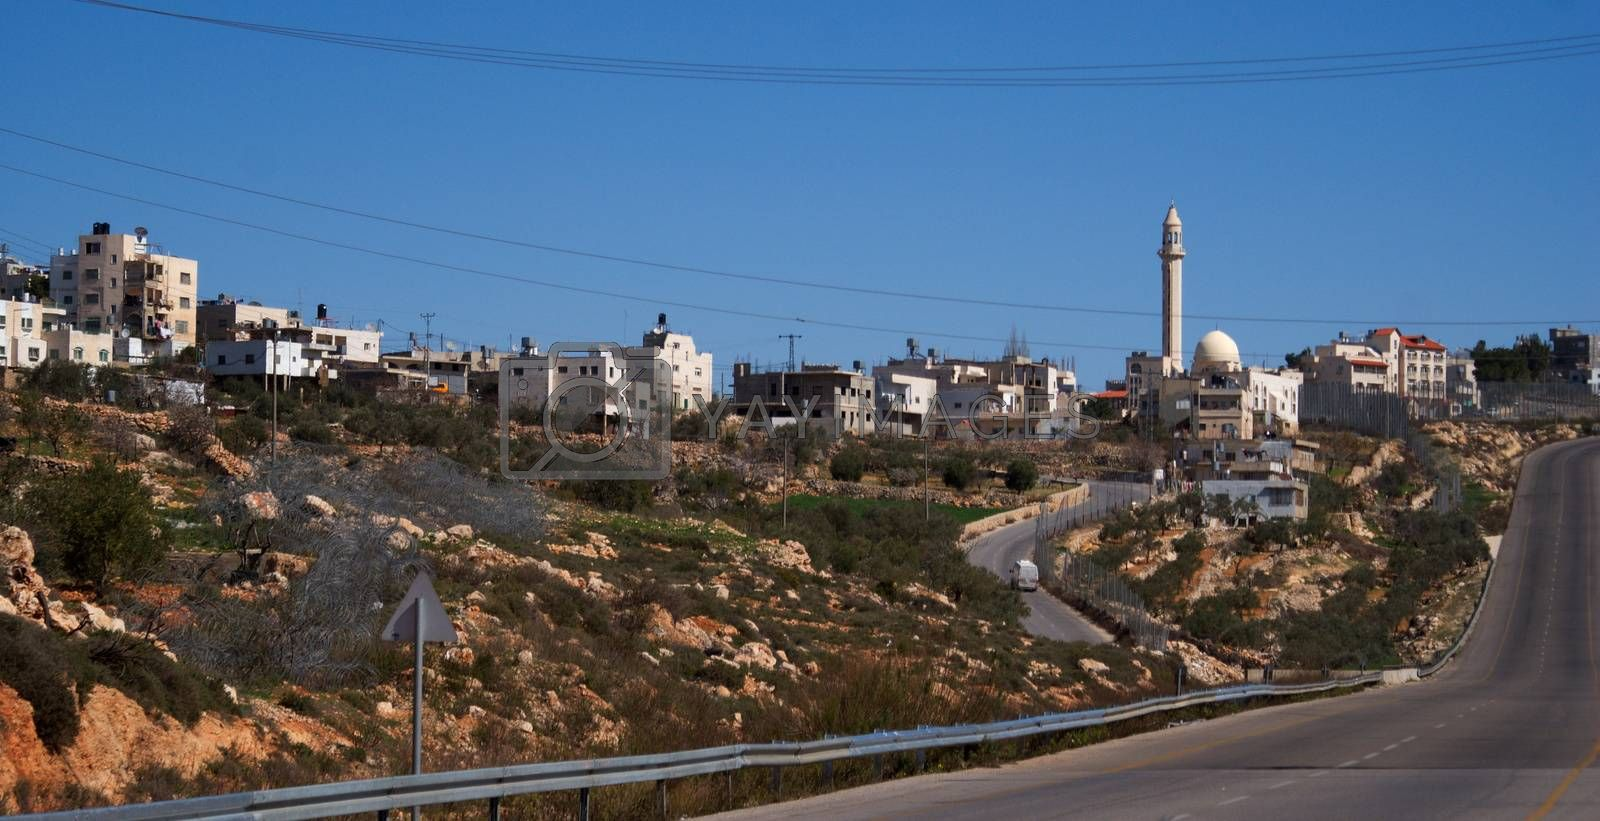 Palestine village by javax